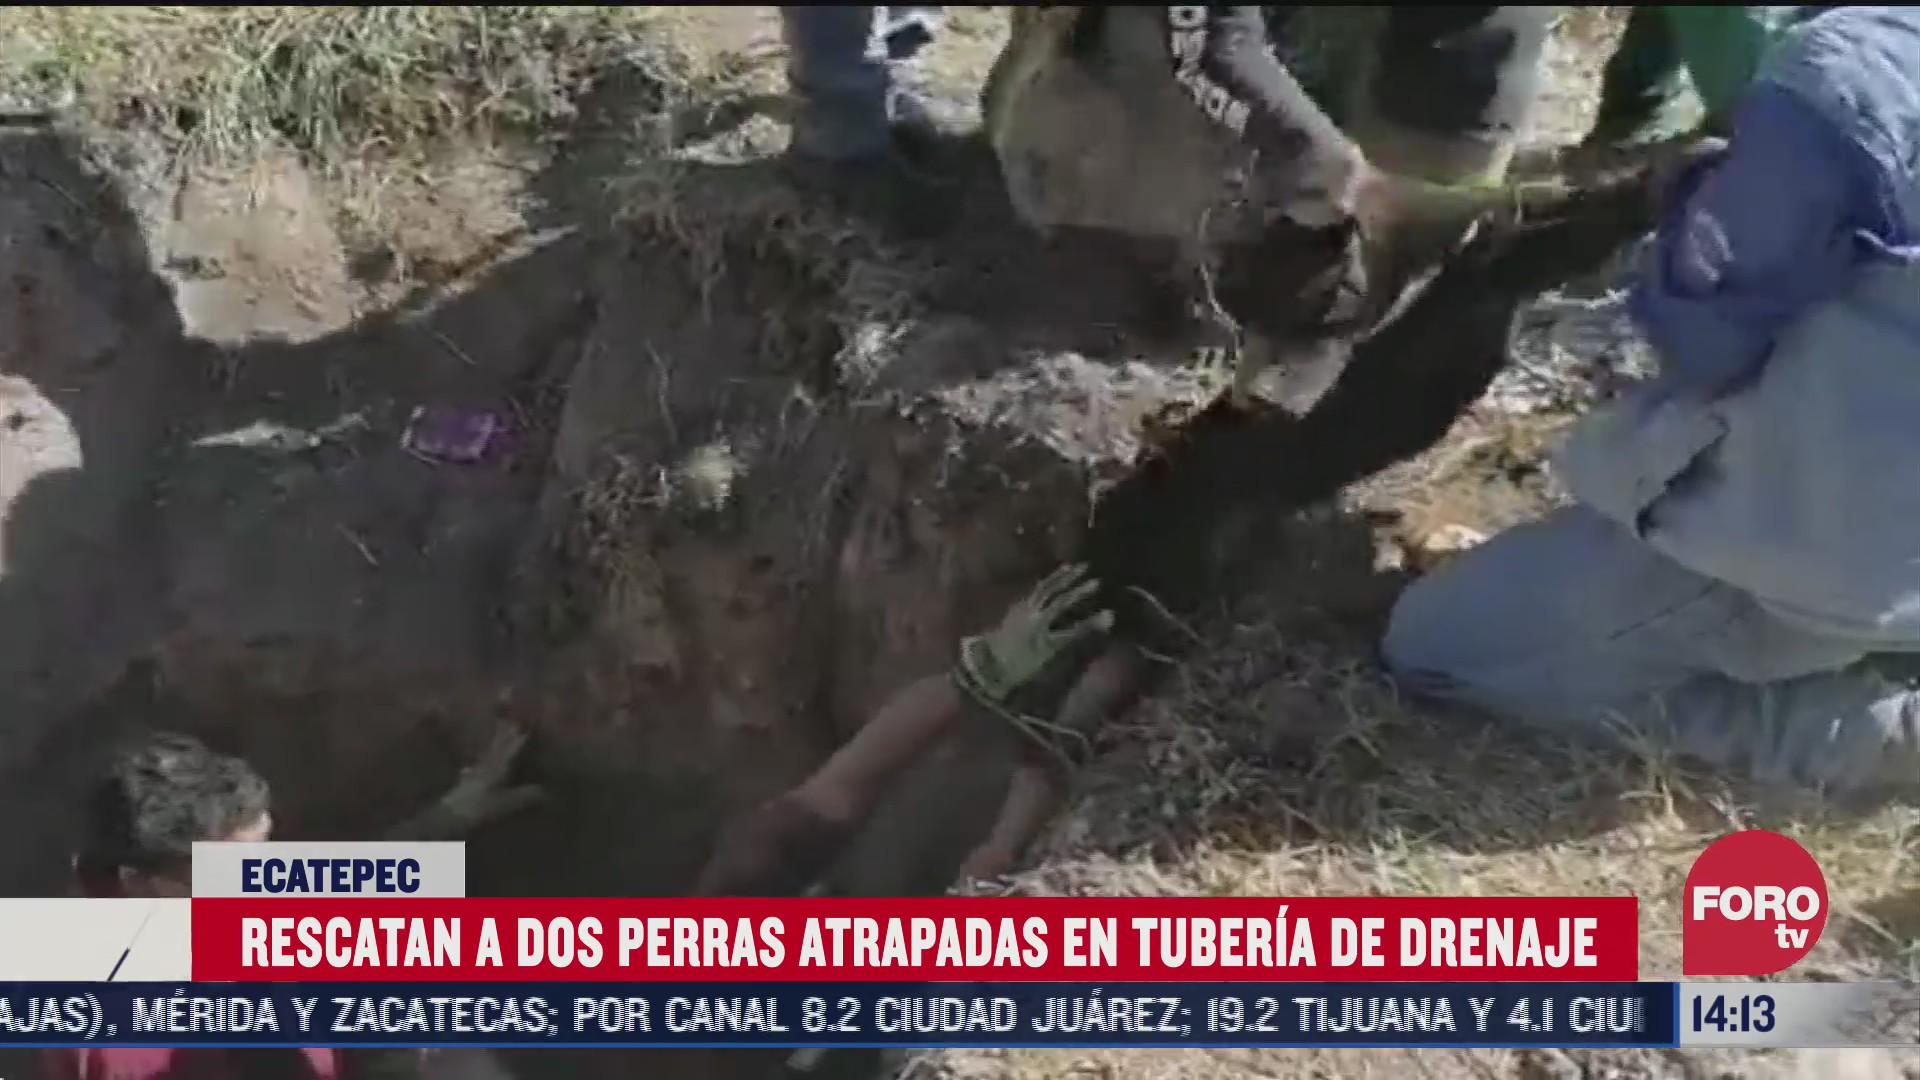 bomberos rescatan perros en drenaje de ecatepec